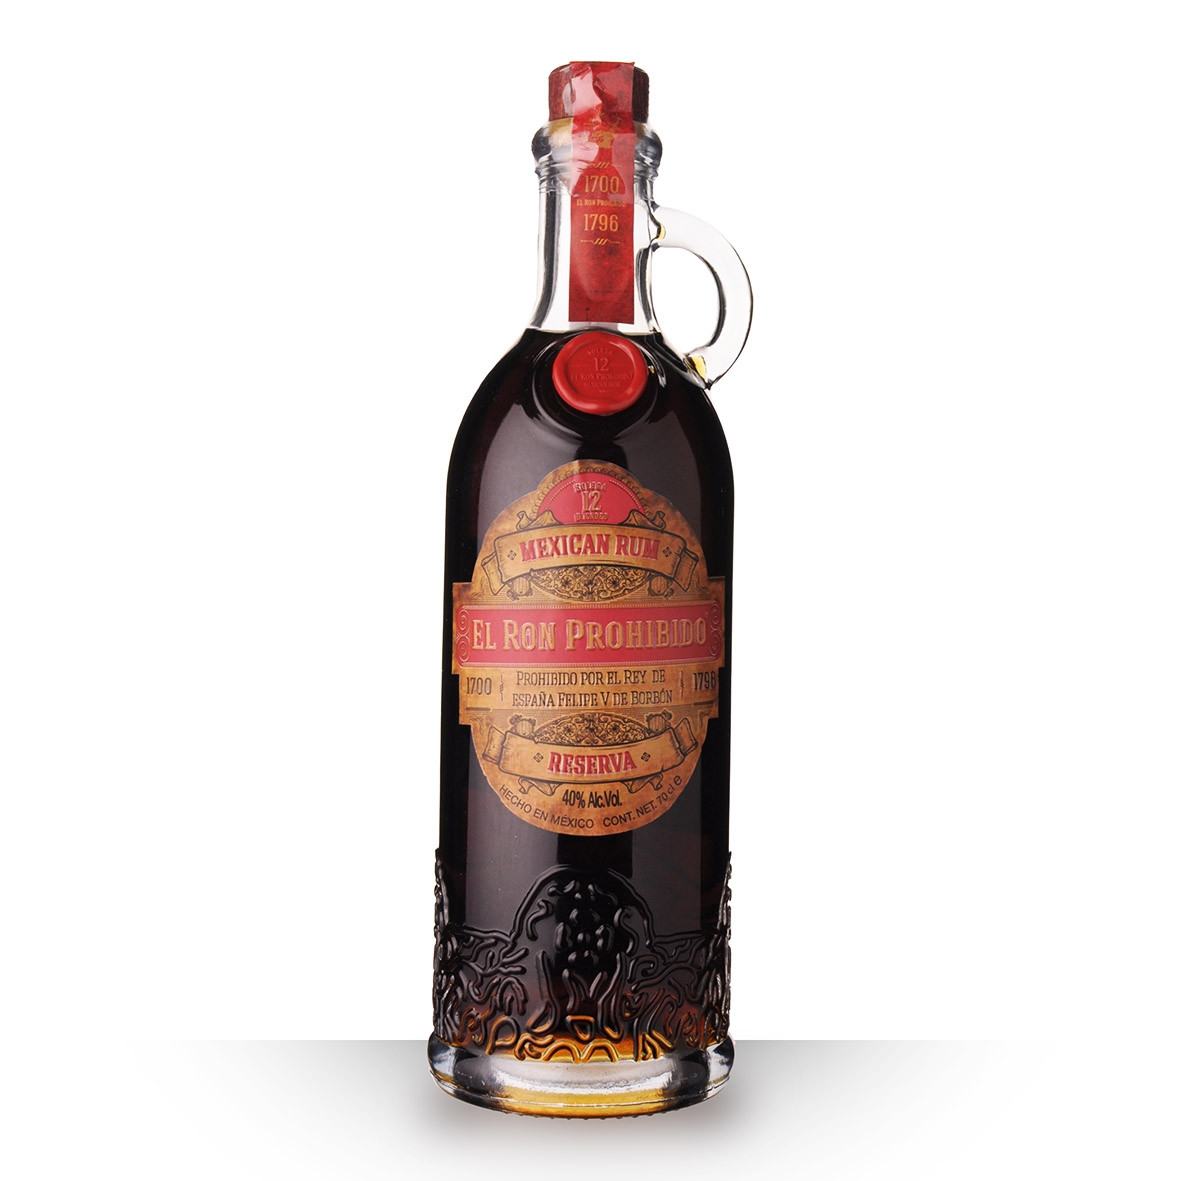 Rhum Prohibido 12 ans 70cl www.odyssee-vins.com